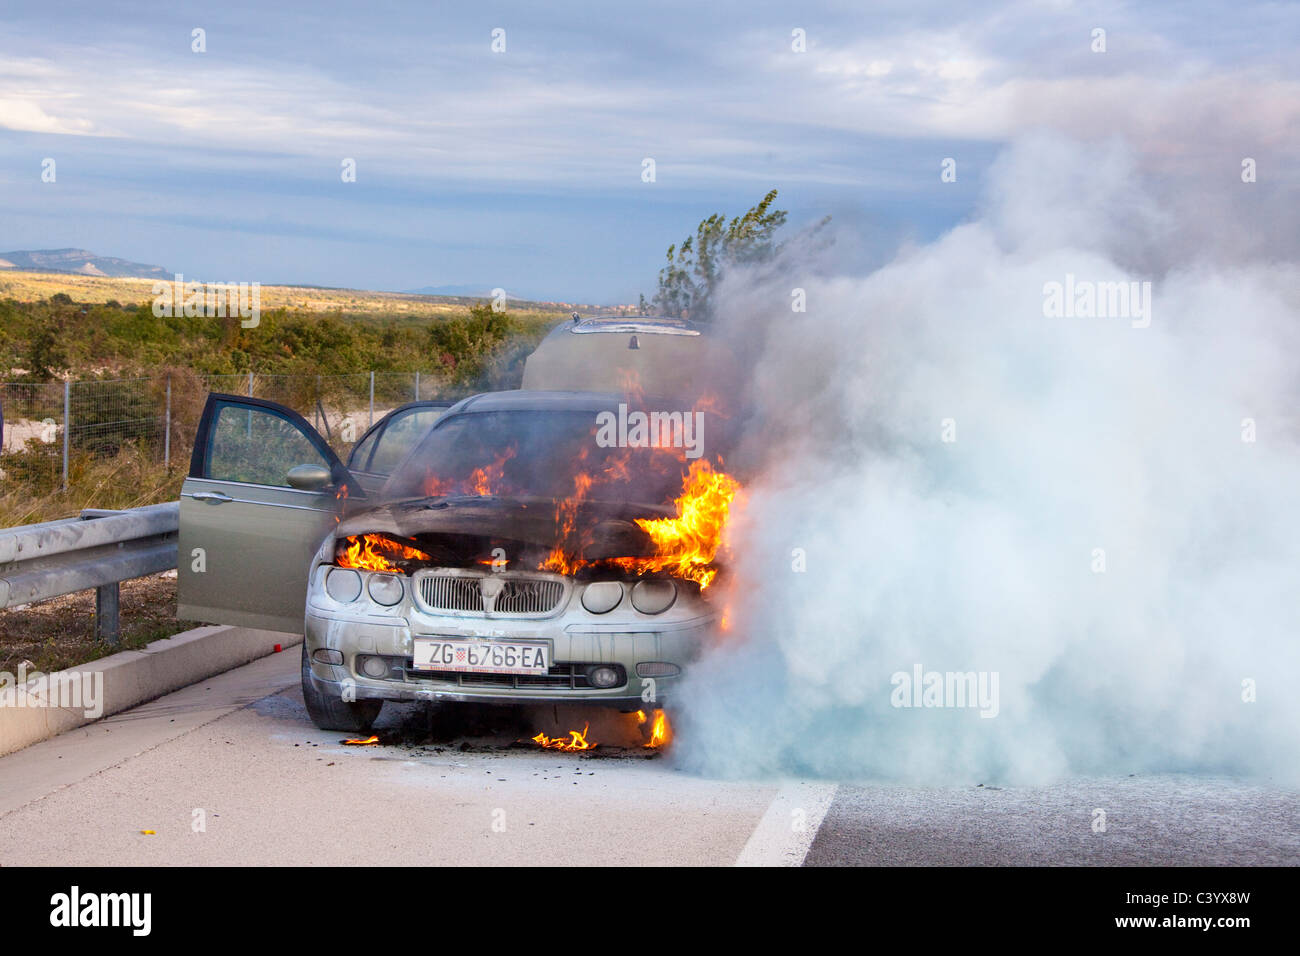 Croacia, Europa, accidente, accidentes, coche, automóvil, quemar, humo, calle Imagen De Stock